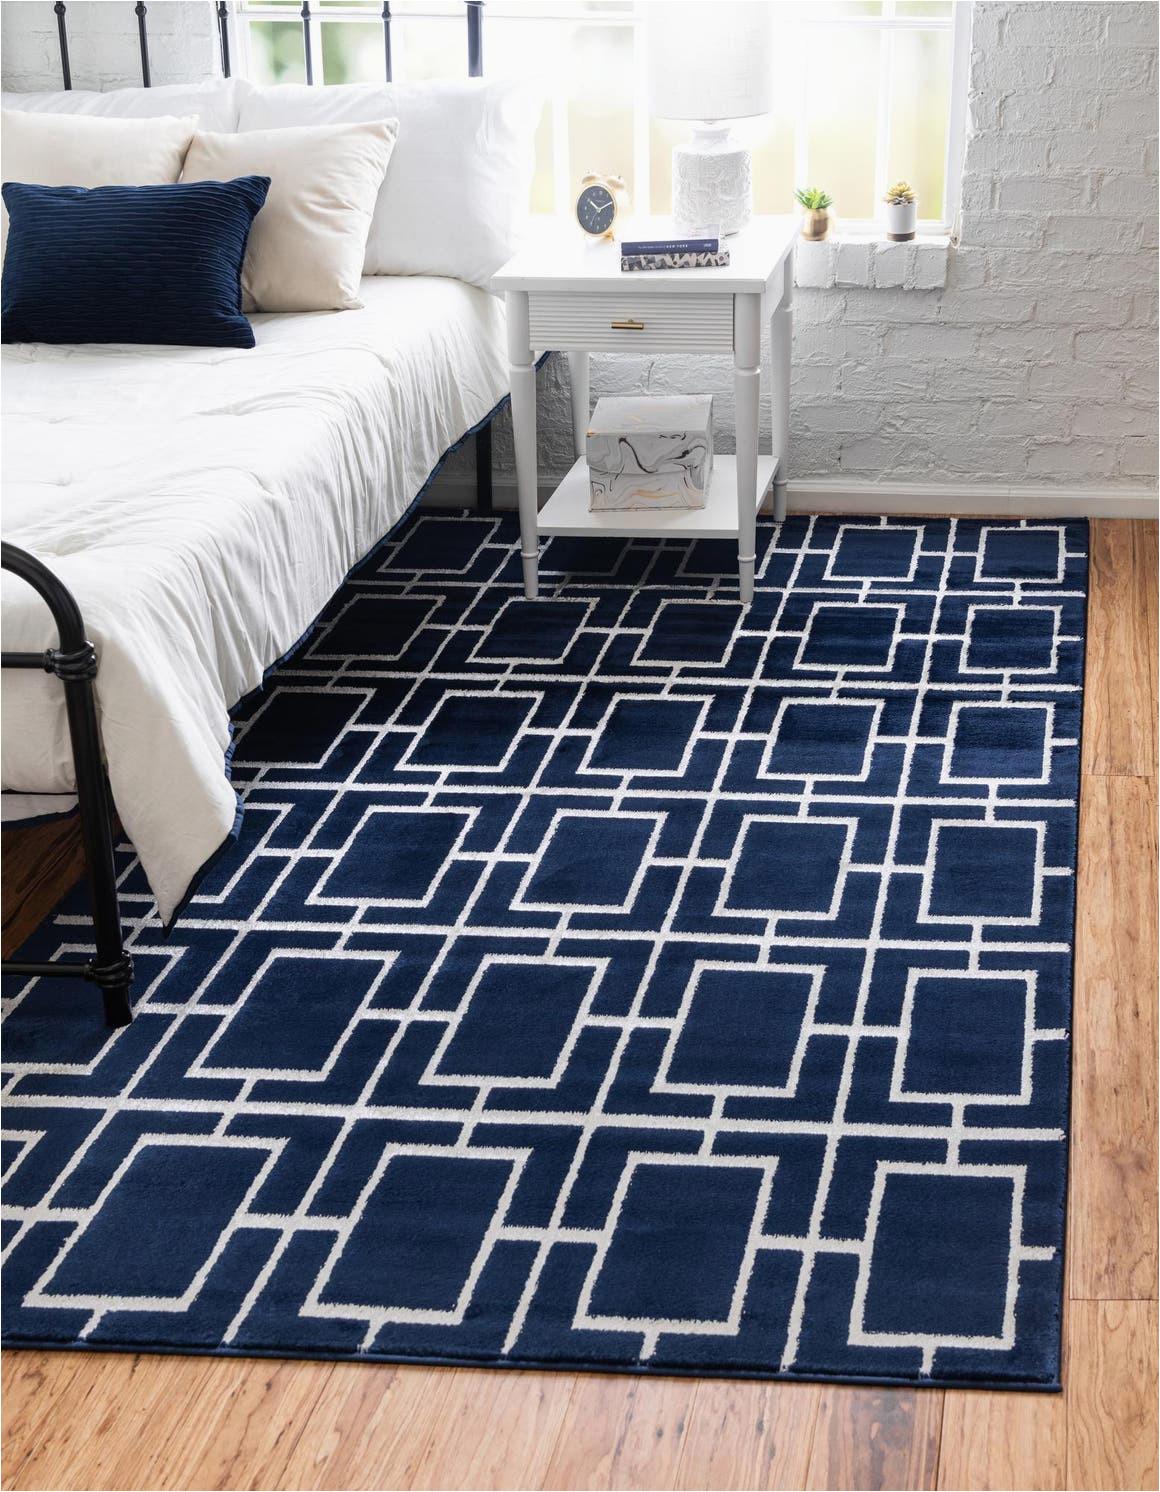 navy blue silver 8x10 marilyn monroe area rug 33142425